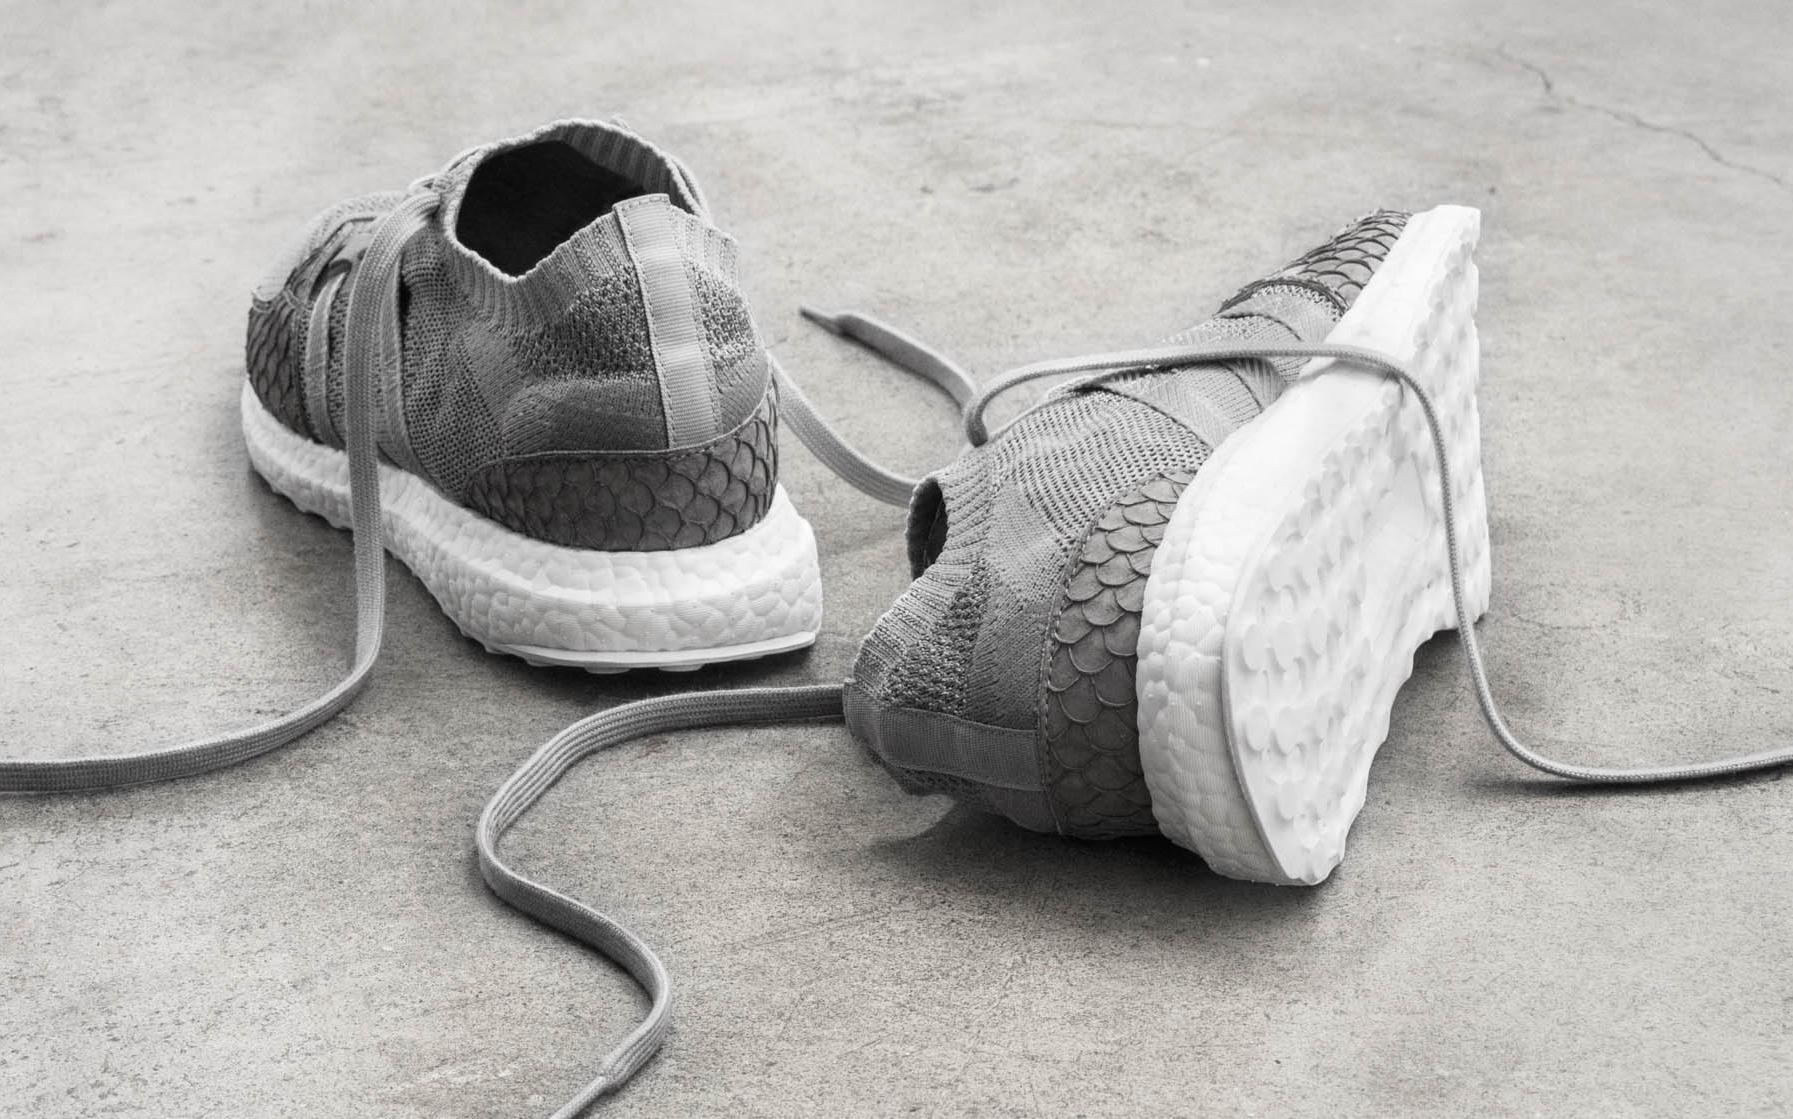 chaussure-pusha-t-x-adidas-equipment-91-16-boost-primeknit-king-push-6